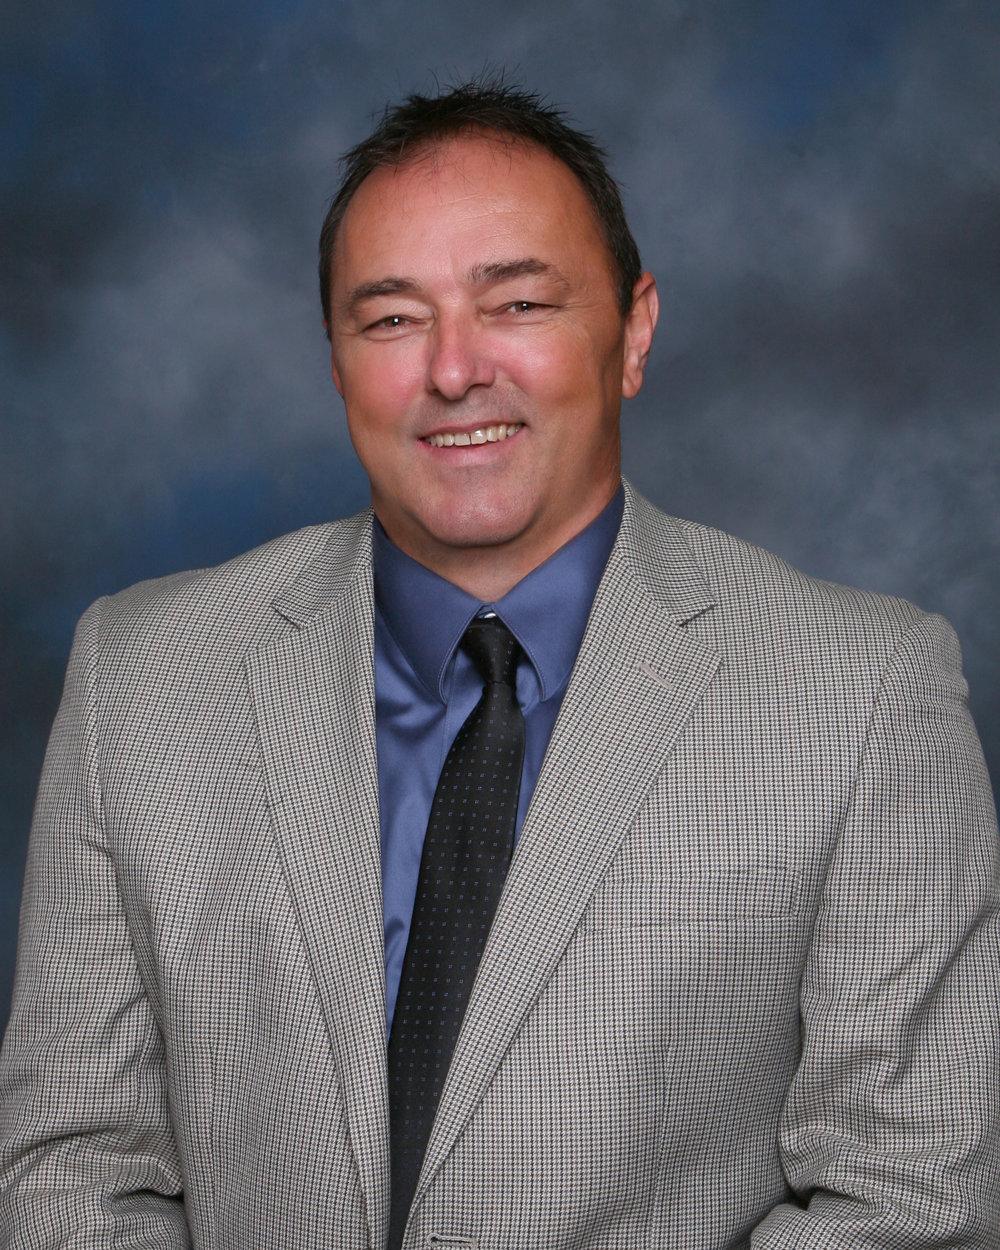 Tony Cornner - Region II